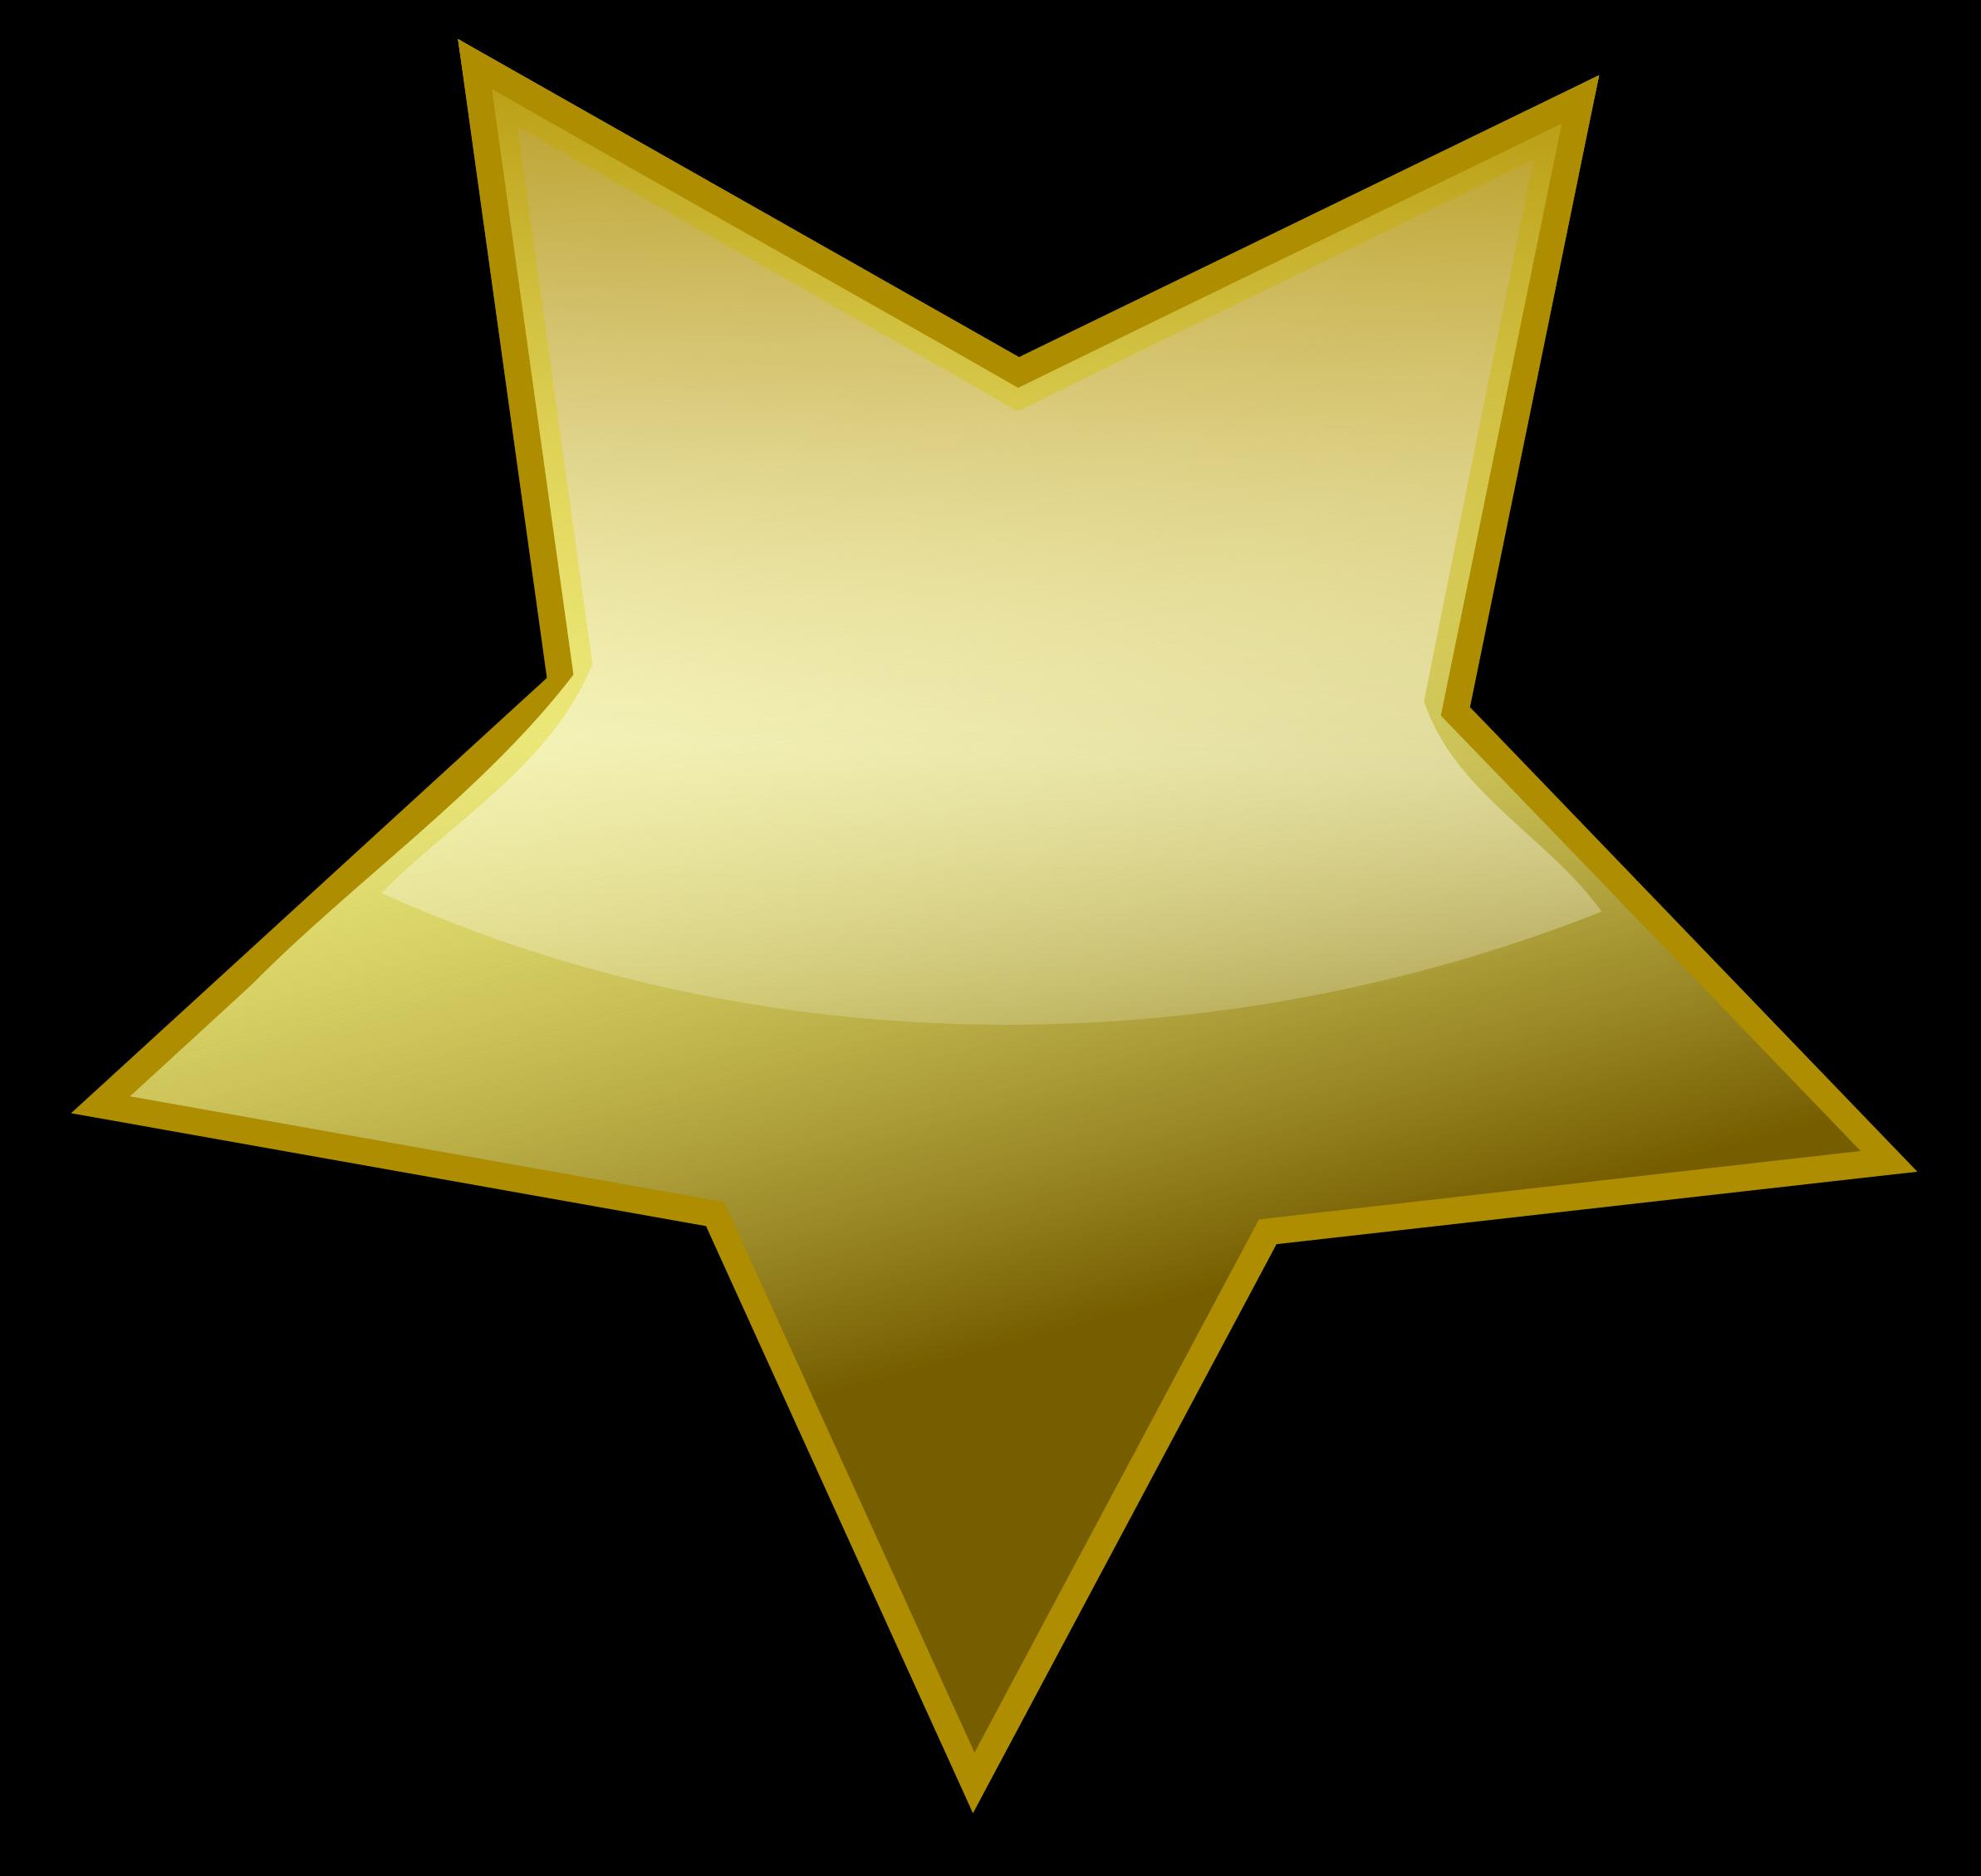 Transparent celebrate clipart - Gold Star Clip Art At Clkercom Vector Online Royalty - Gold Star Vector Png